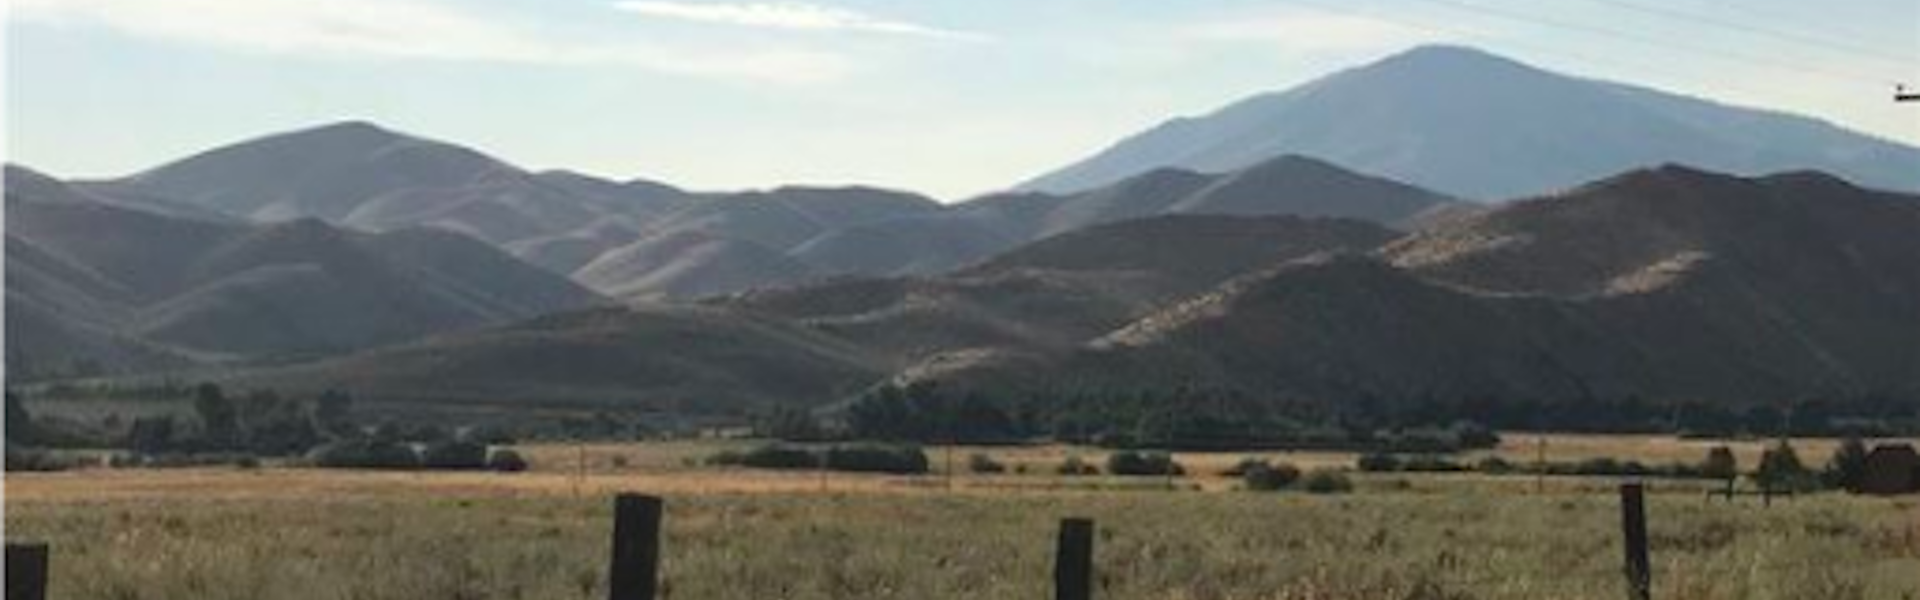 Backcountry Paradise on 2.5 Acres in Fairfield